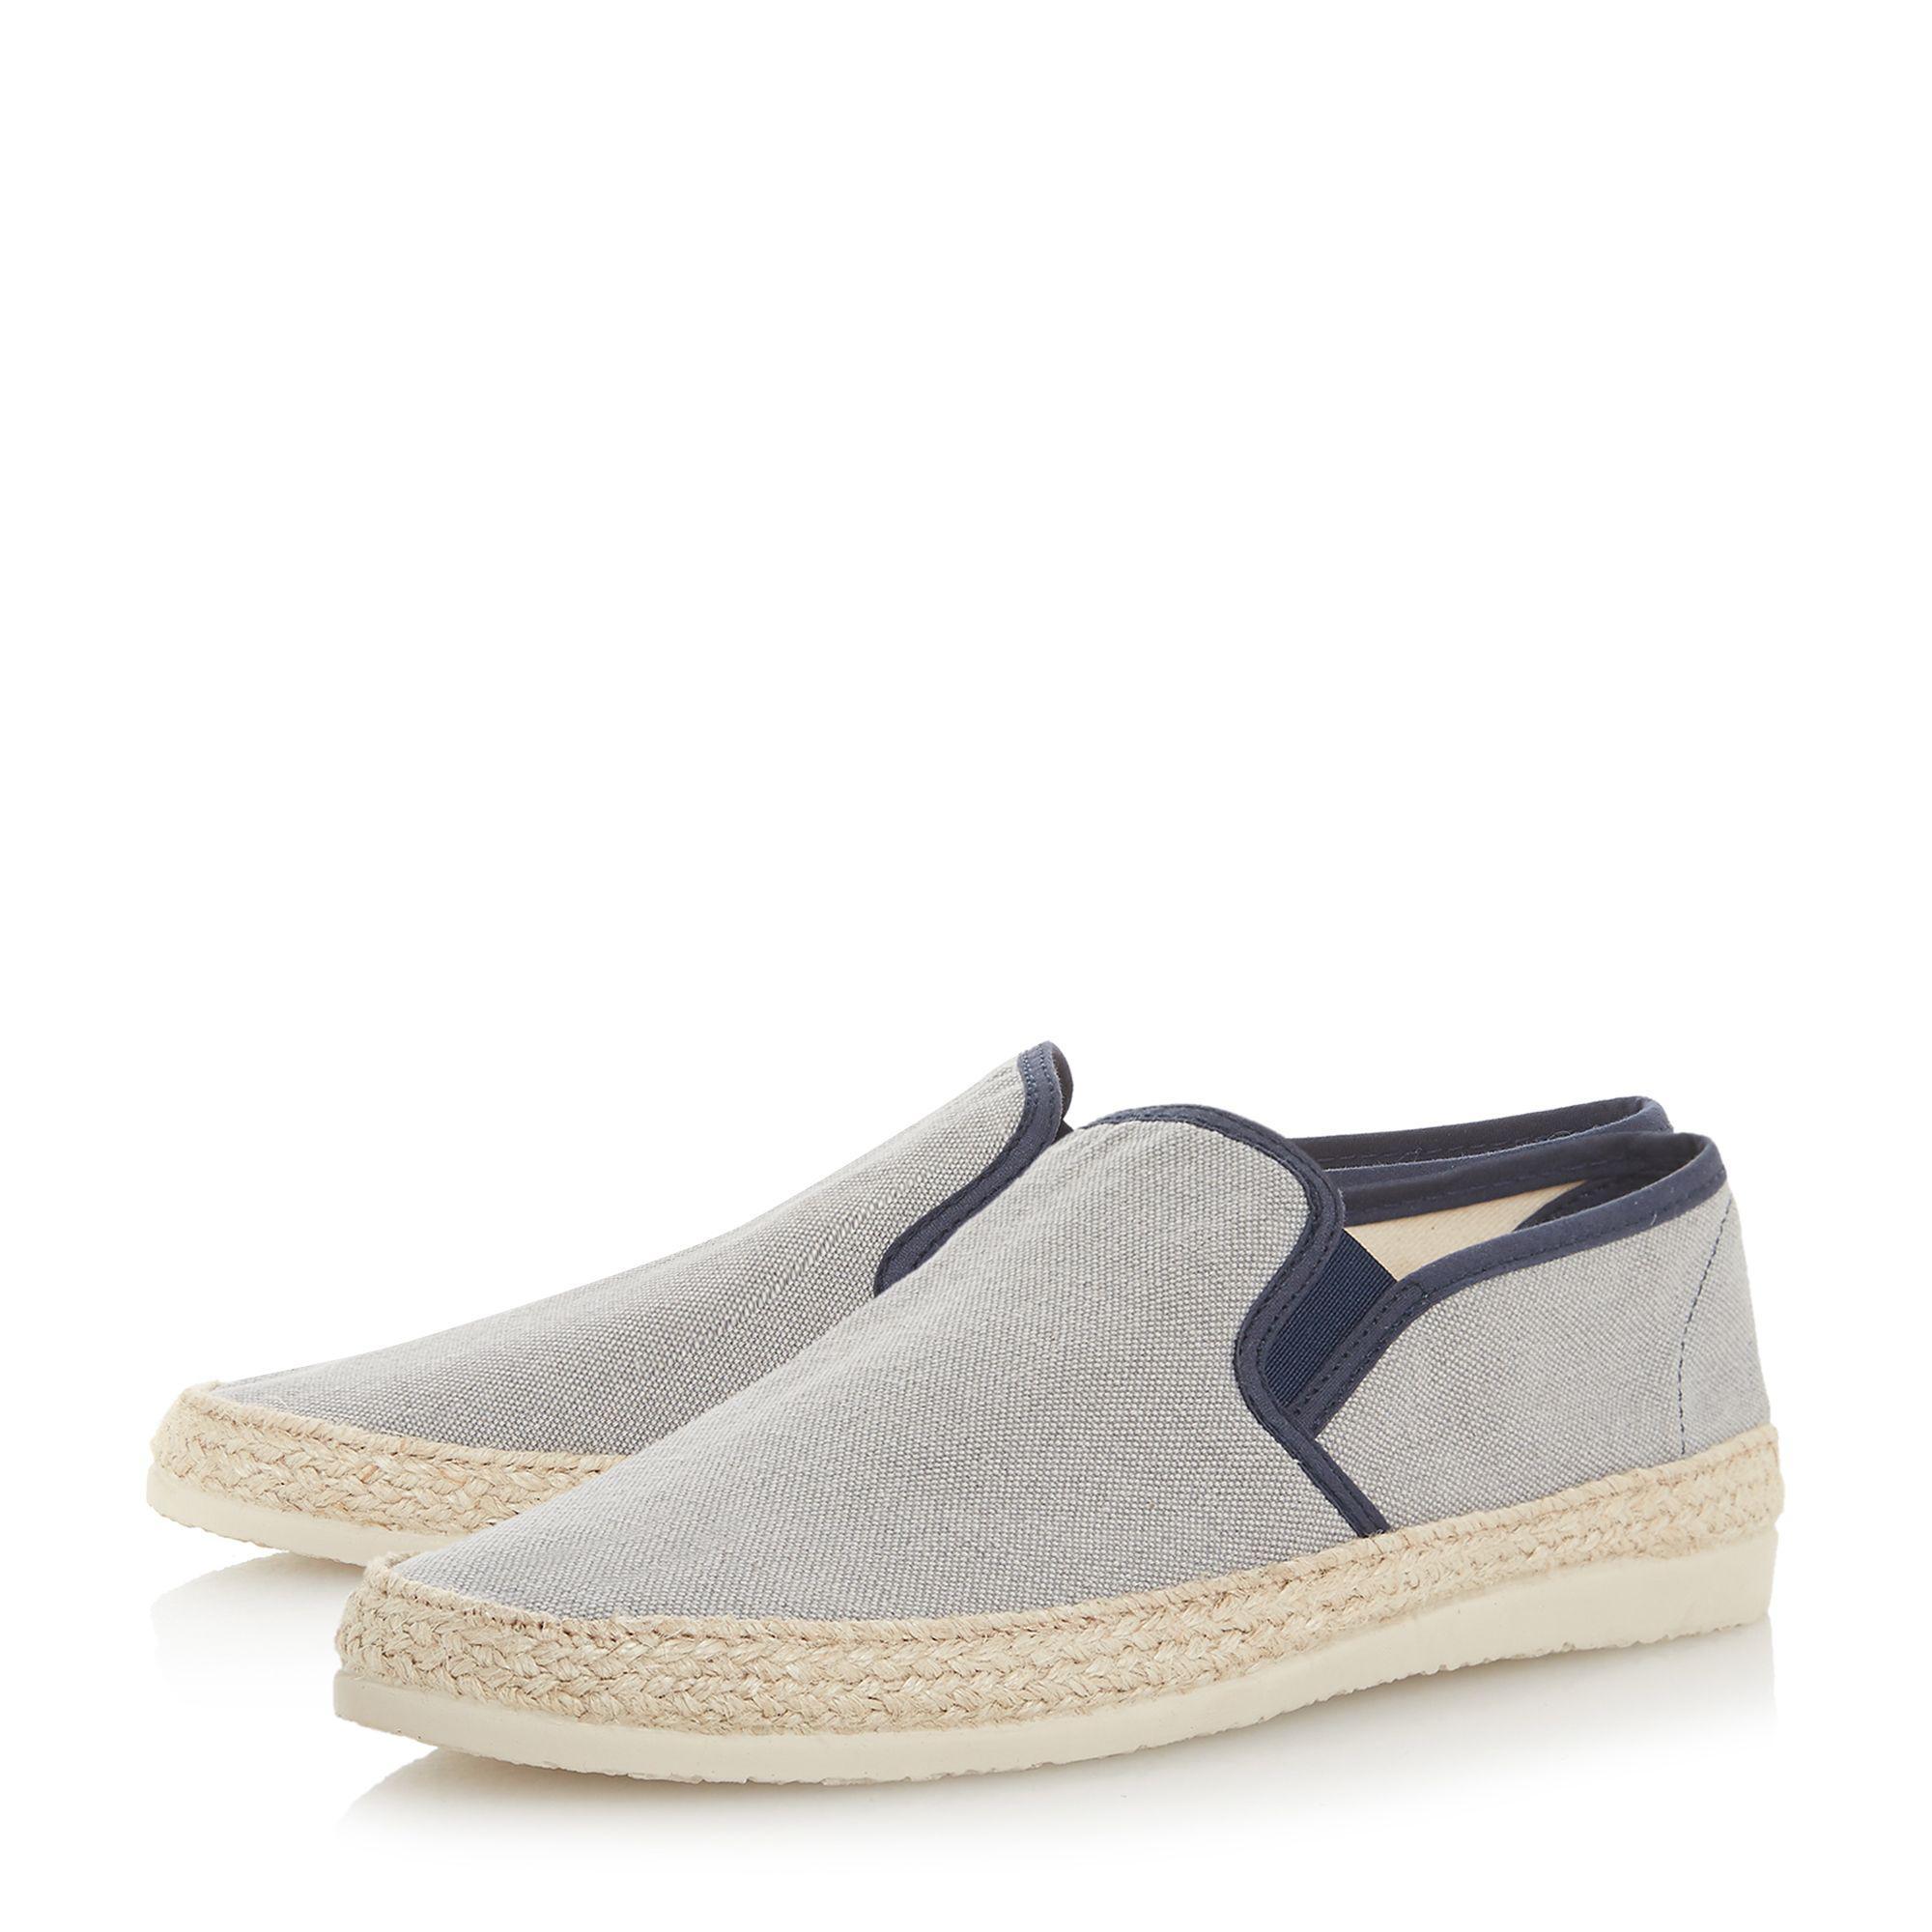 4cf85cbe Dune Grey 'fabien' Espadrilles Trim Canvas Shoes in Gray for Men - Lyst